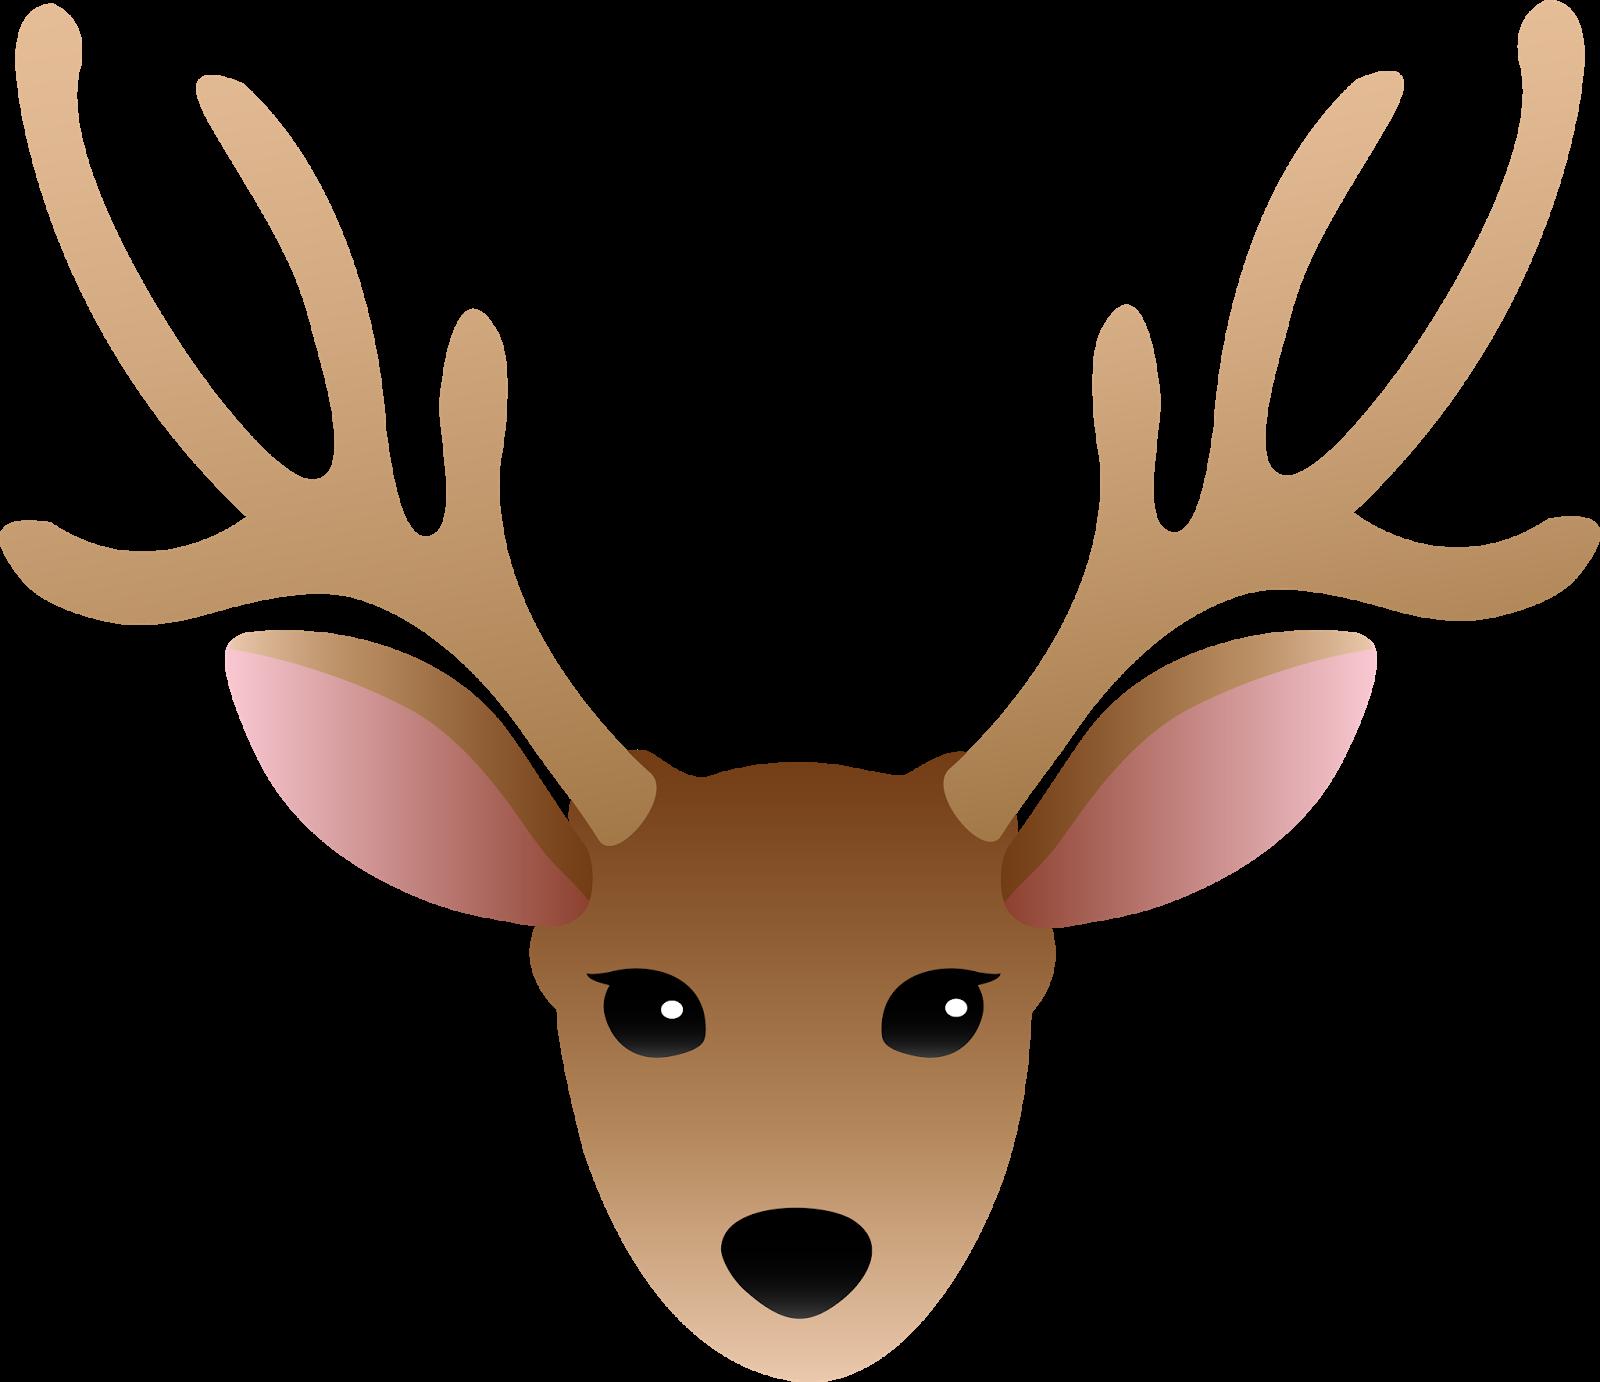 Horn clipart antler. Cuttlebug mania o deer